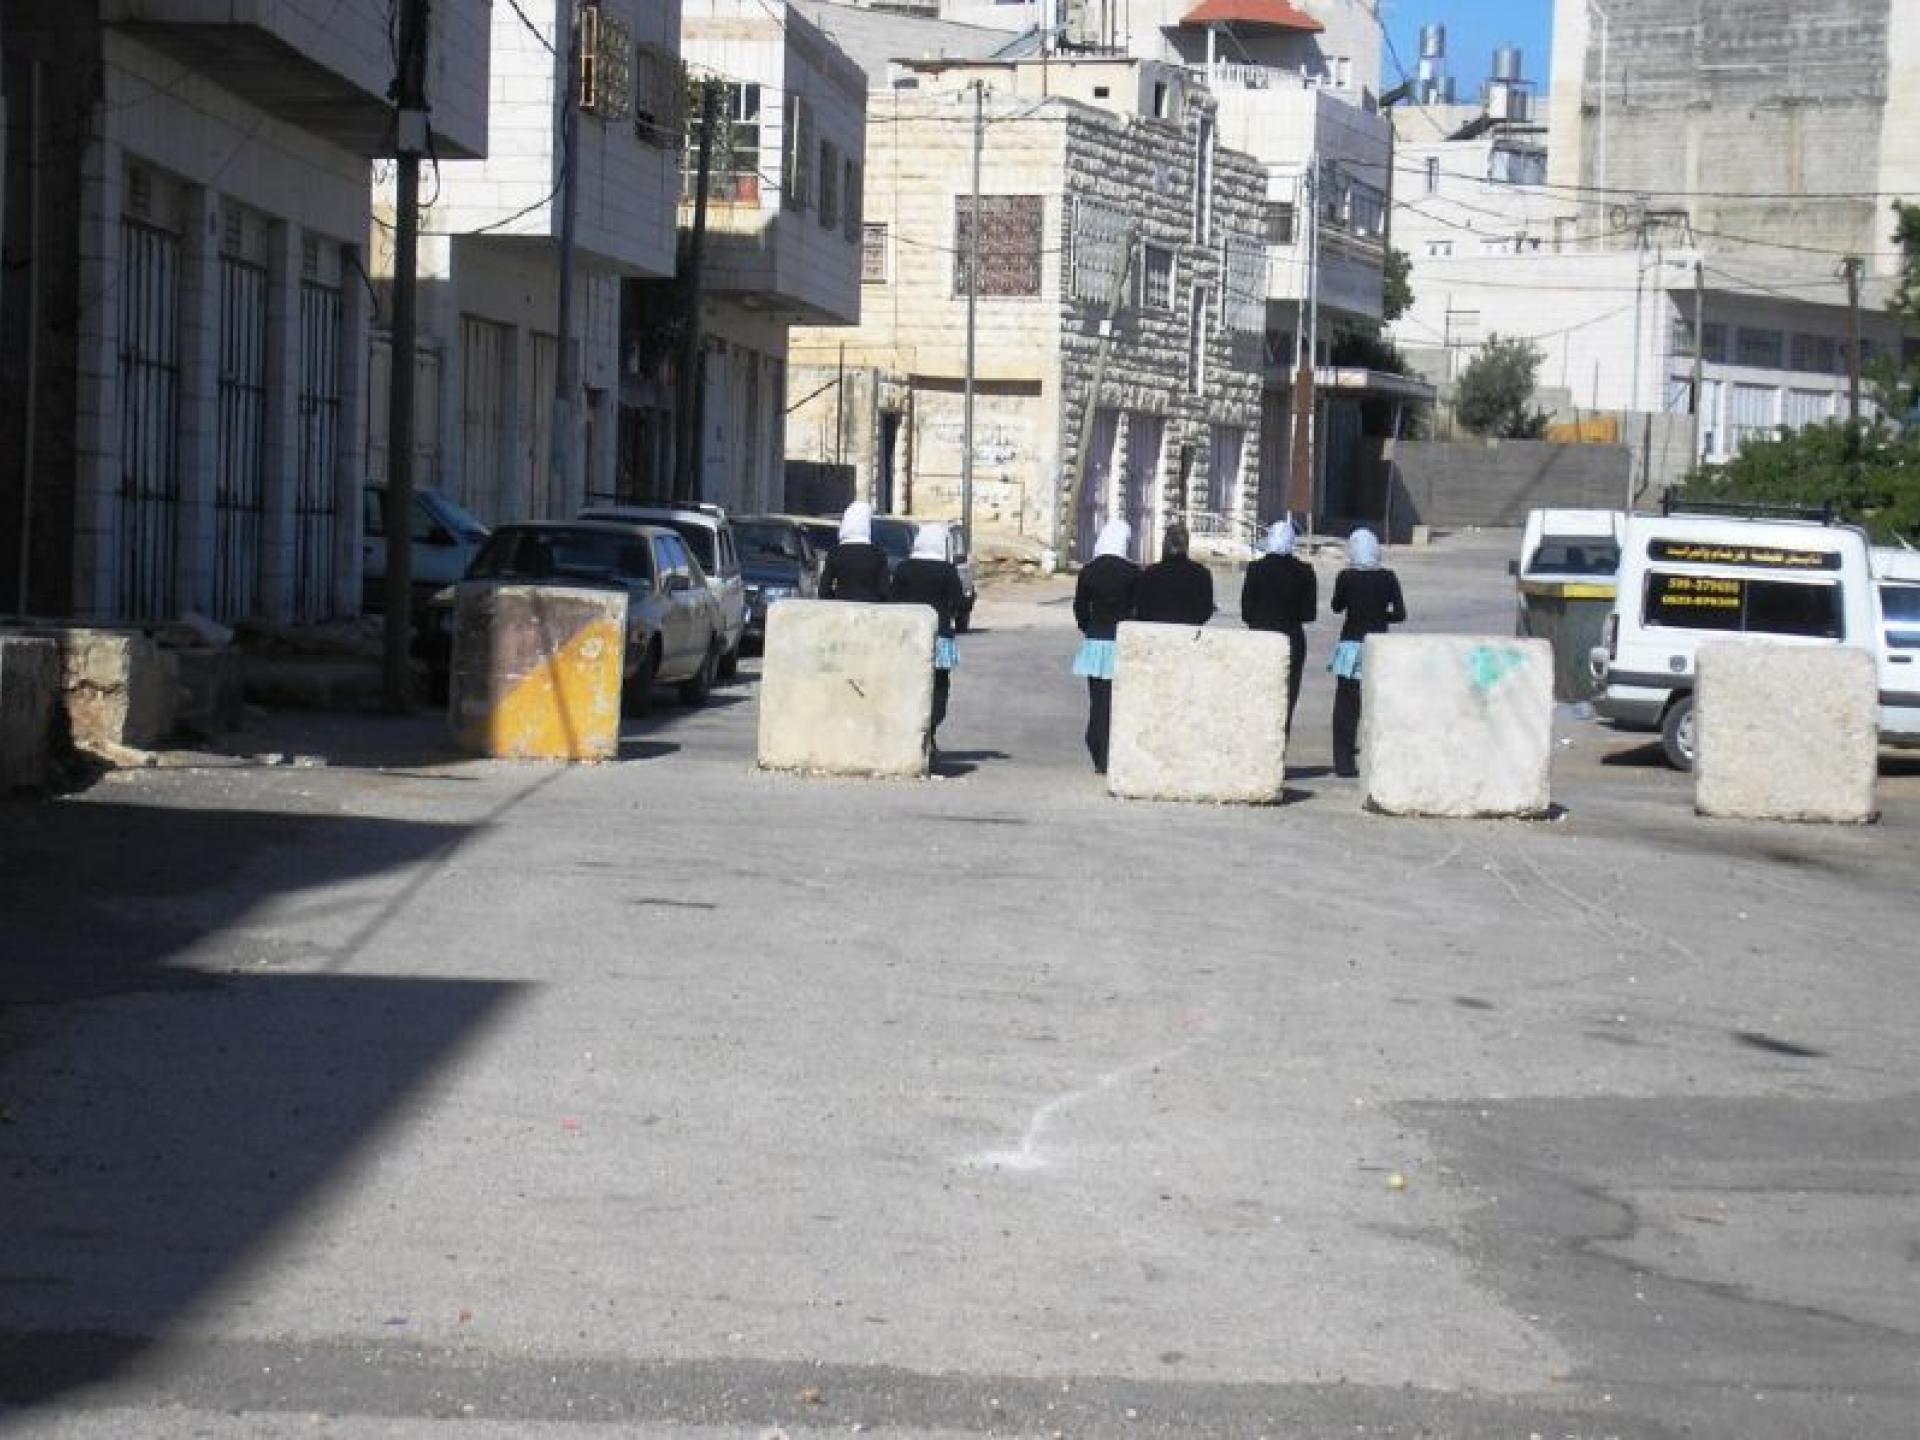 Hebron 06.05.08